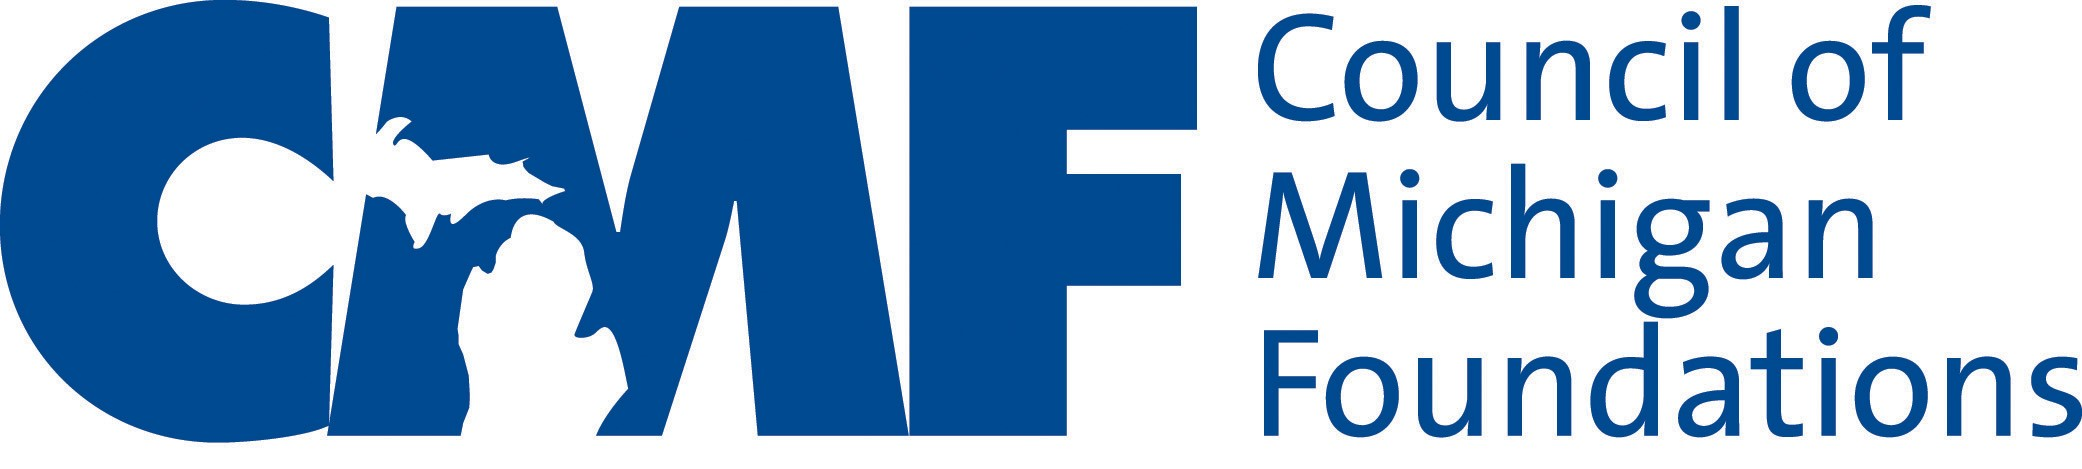 Council of Michigan Foundations Logo